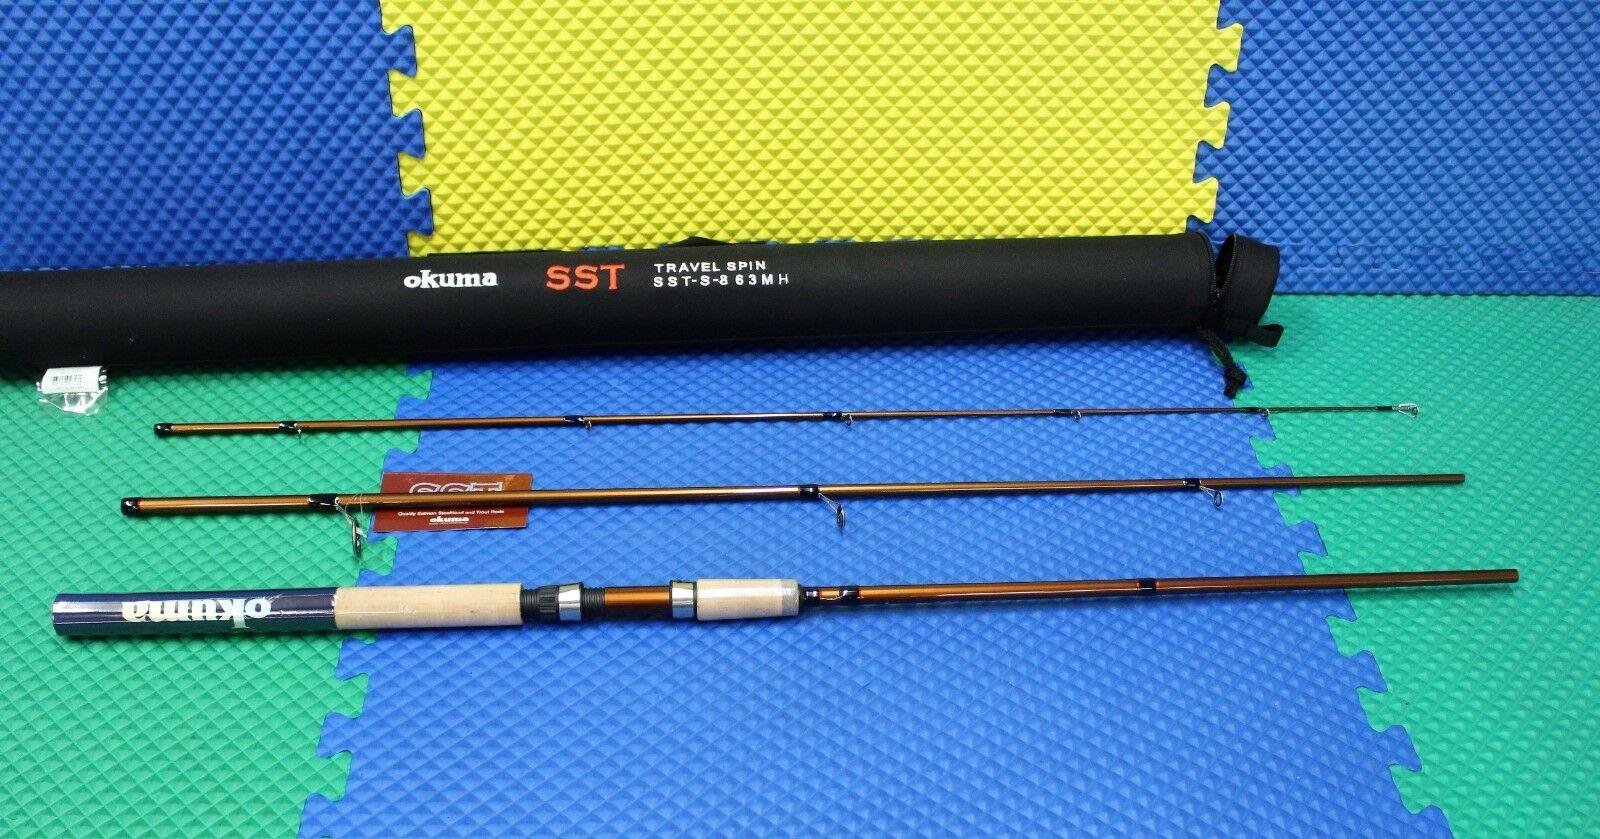 Okuma SST Travel Rod 3-Pc 8' 6   Medium Heavy w Rigid Tube Case SST-S-863MH  fishional store for sale